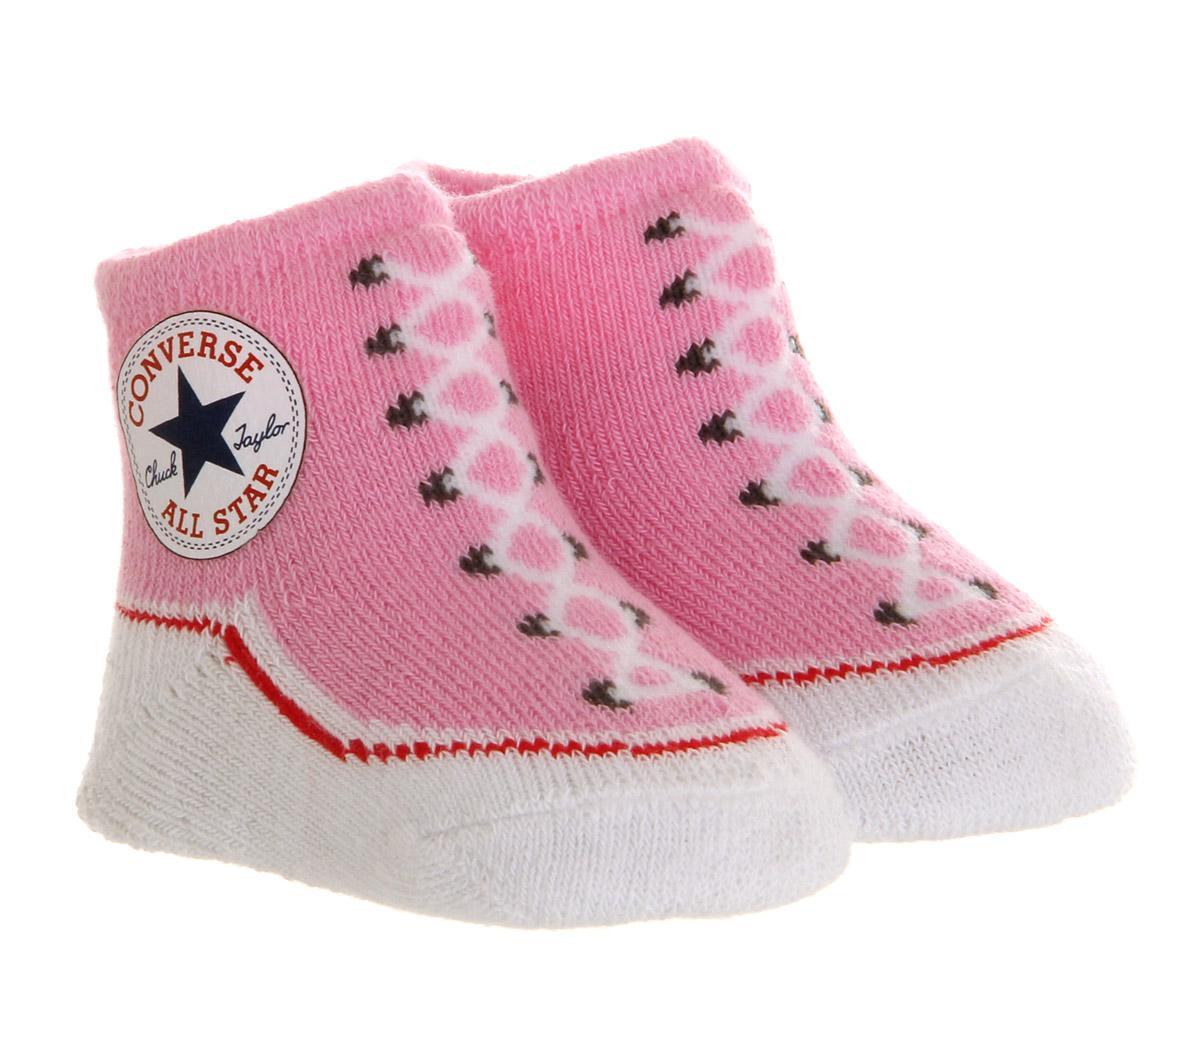 Converse Crib Socks Pink - Kids Trainers